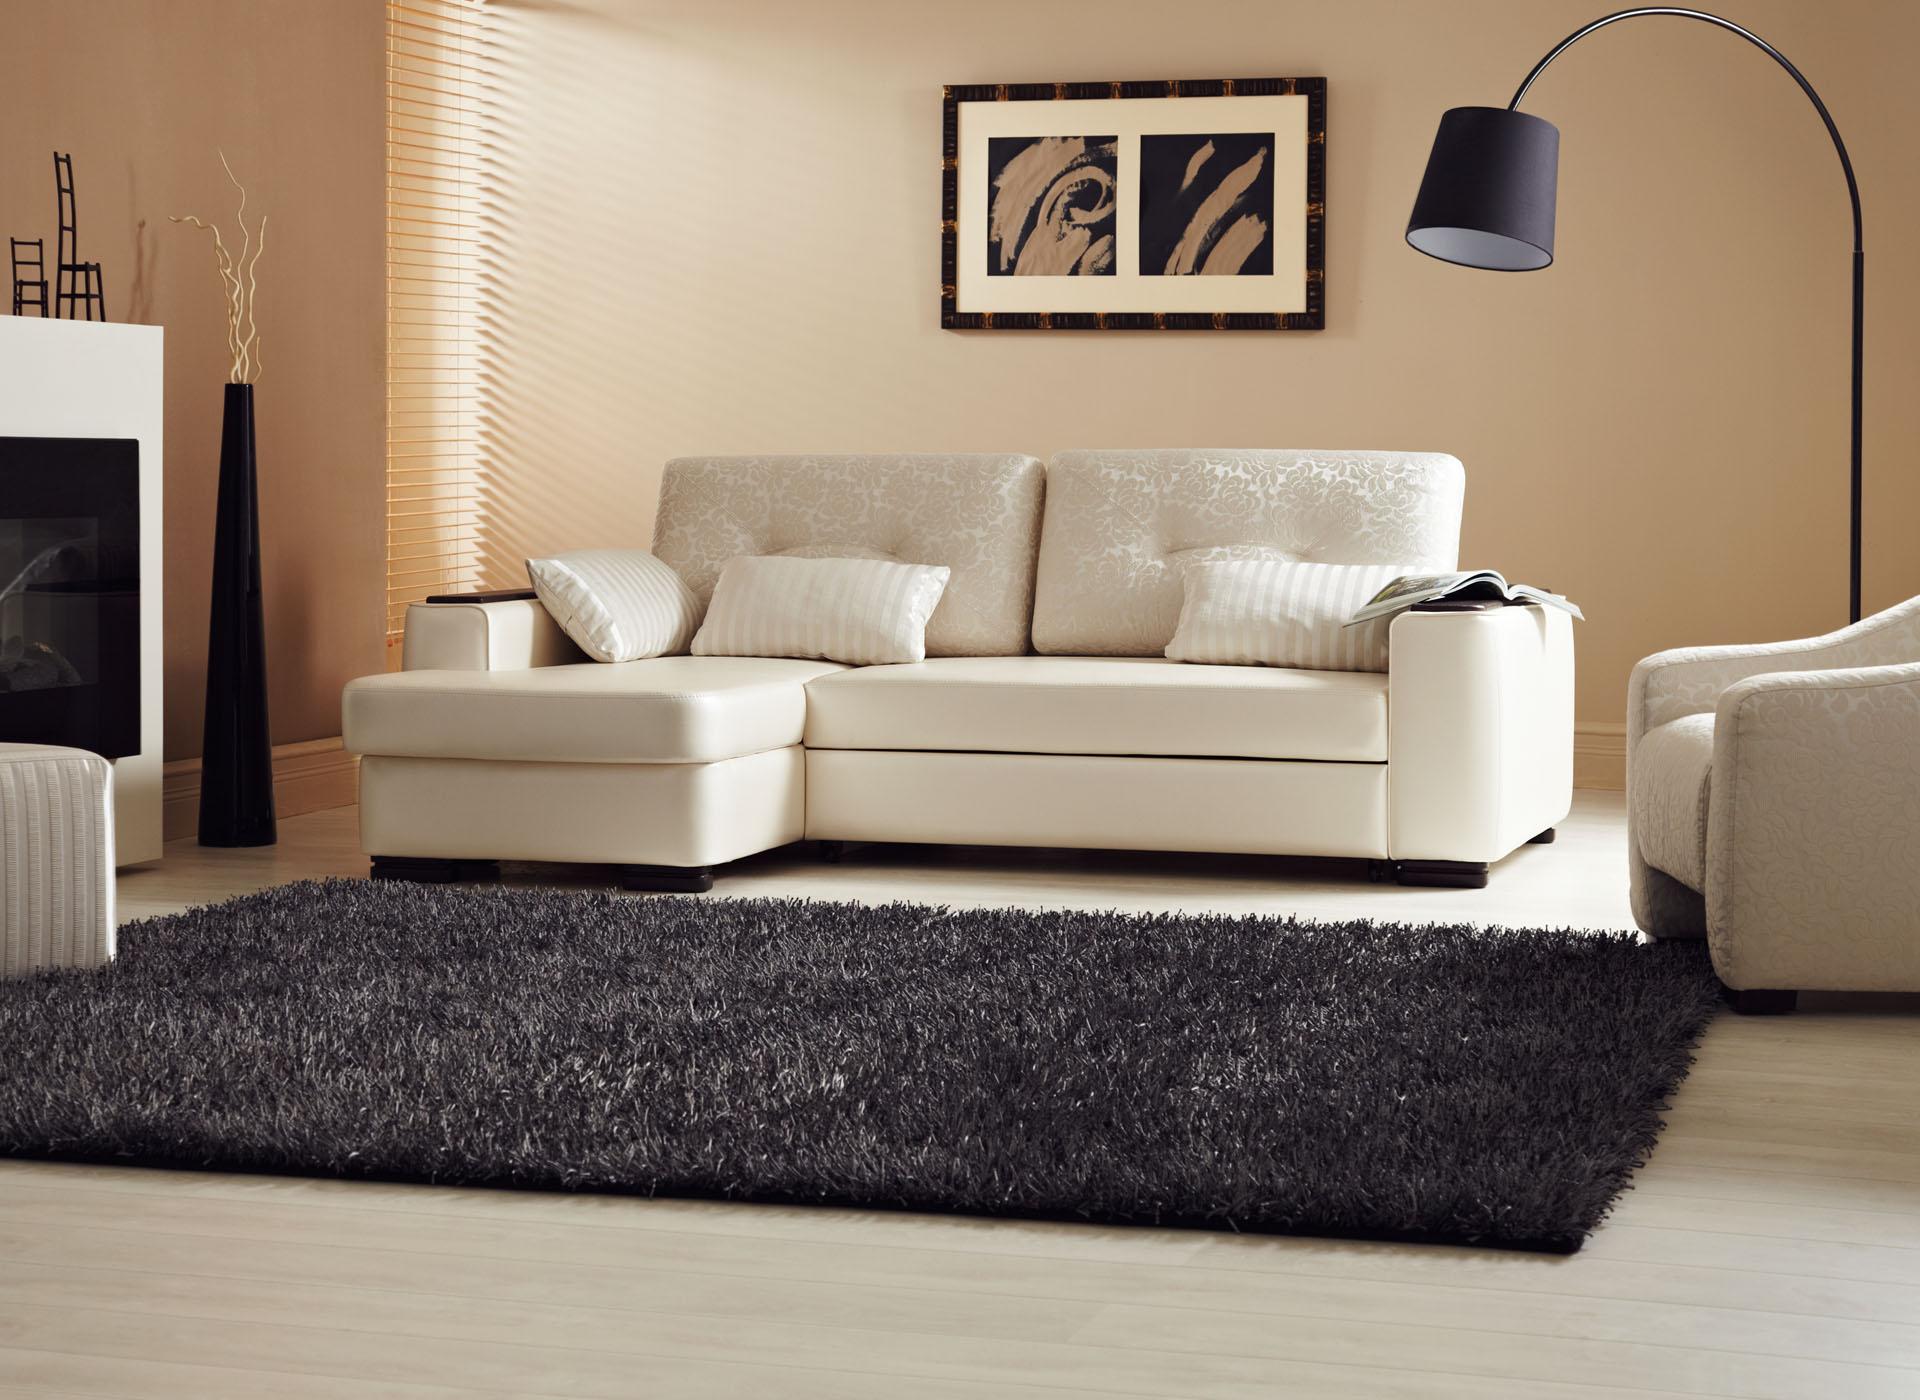 Белый малогабаритный диван